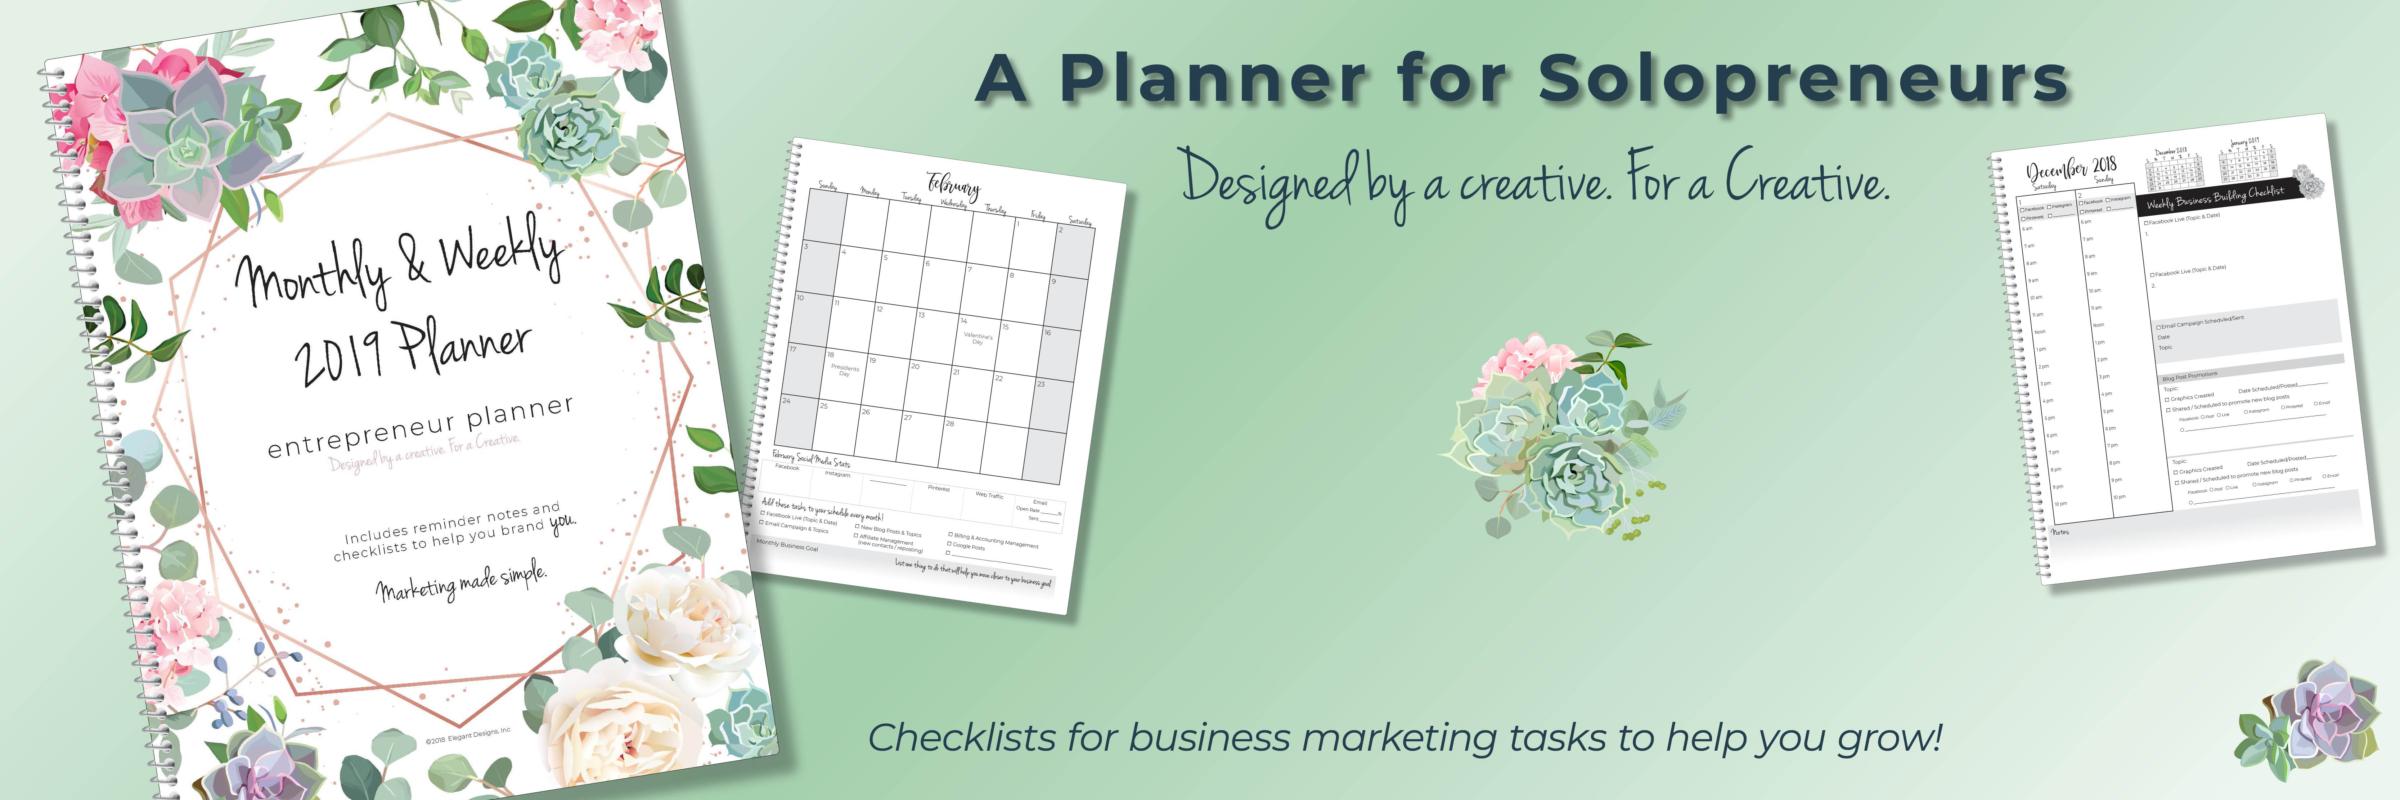 Marketing Planner Slider jan 2019